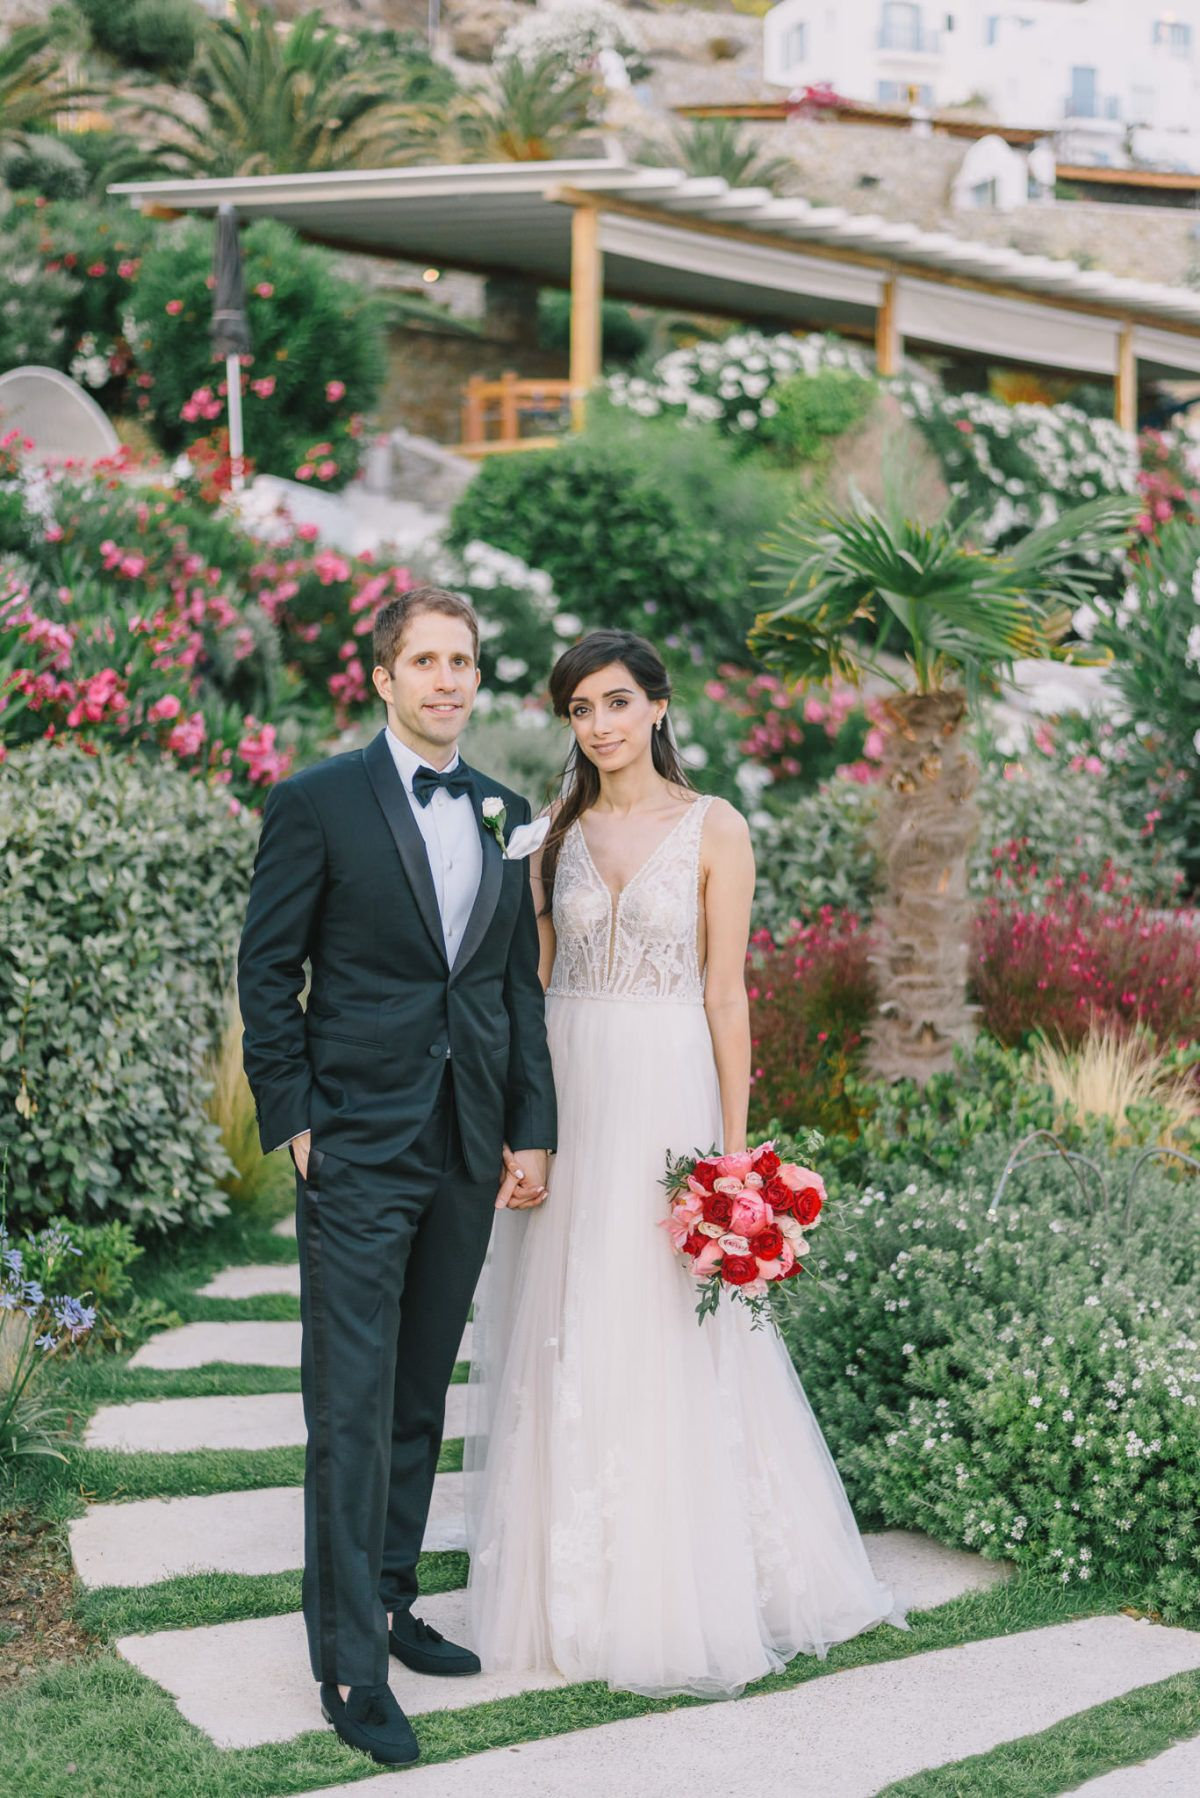 A Luxury Multicultural Wedding At Santa Marina Resort Villas In Mykonos Multicultural Wedding Marina Resort Chicago Wedding Venues